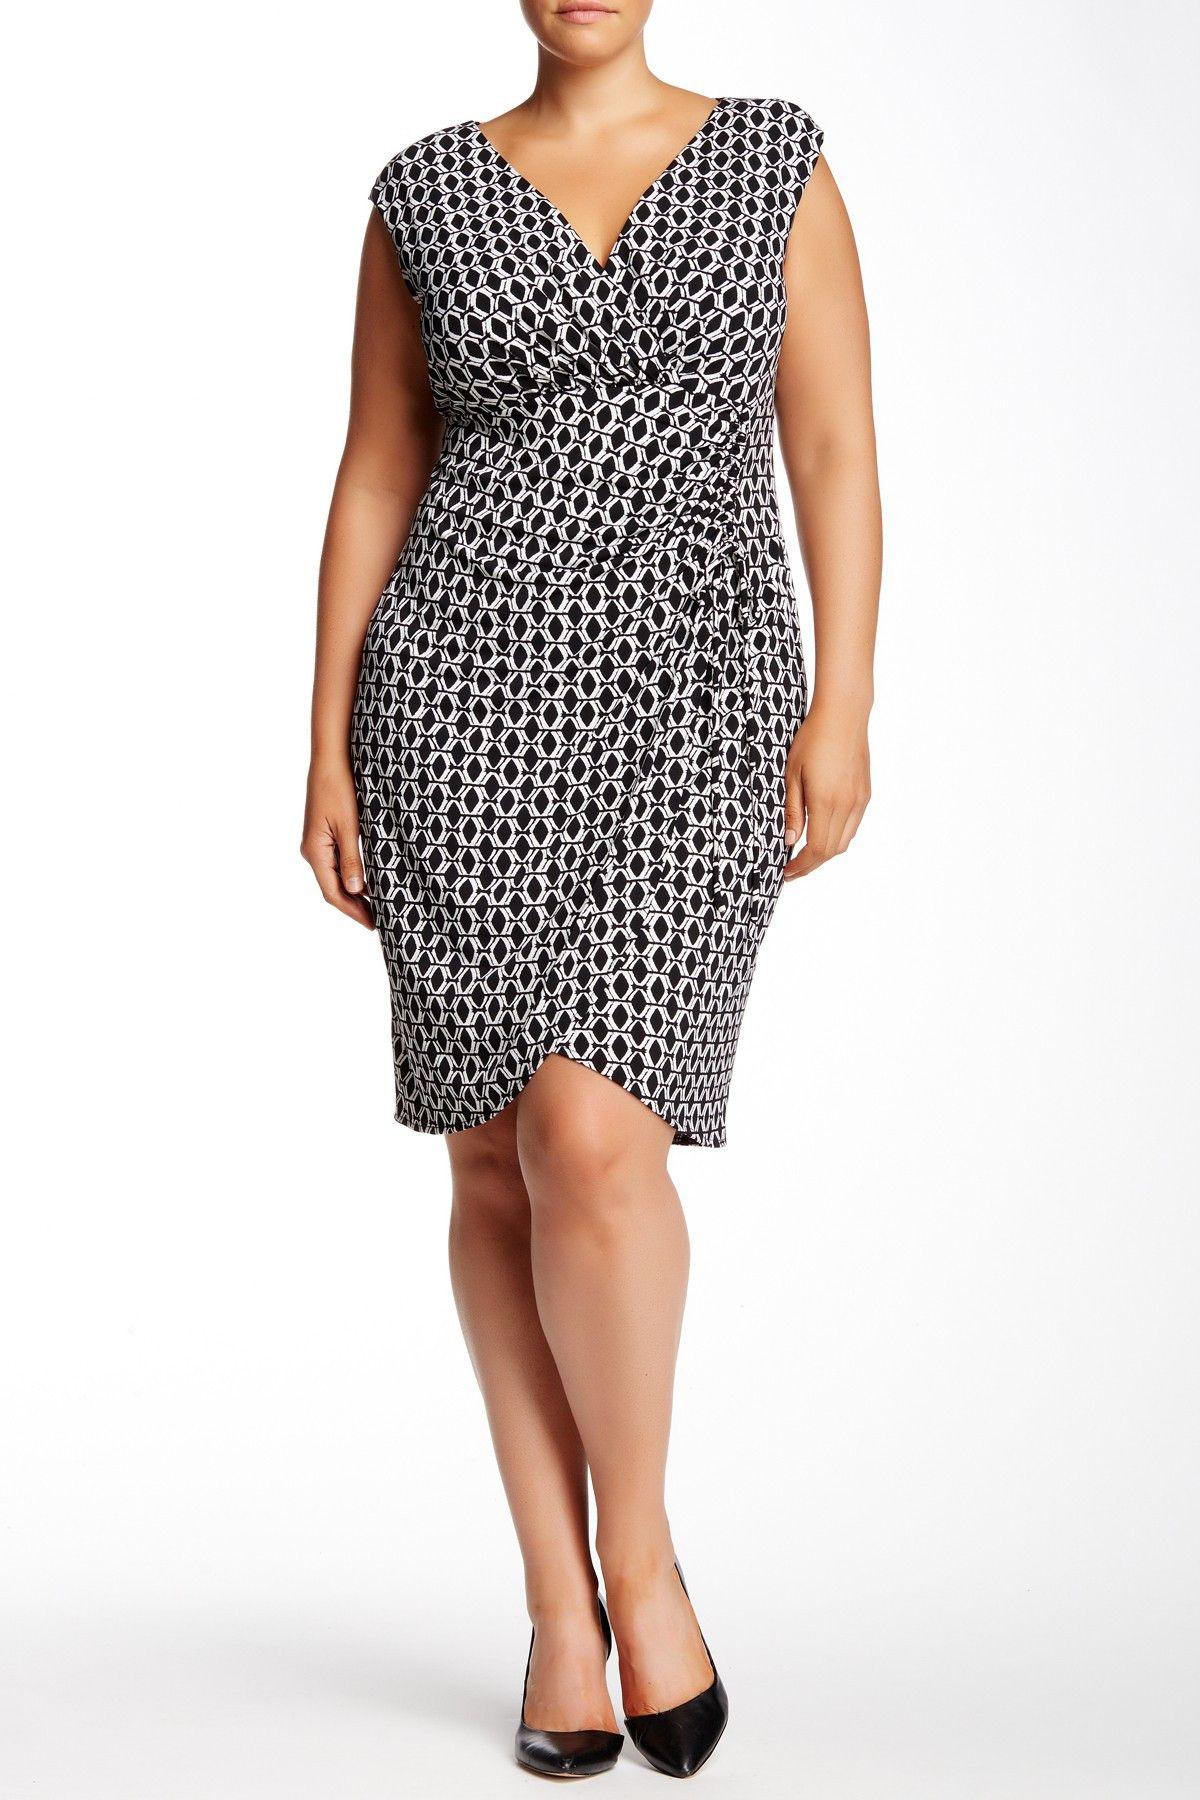 437e8b96064 Nordstrom Rack Womens Plus Size Dresses - Gomes Weine AG